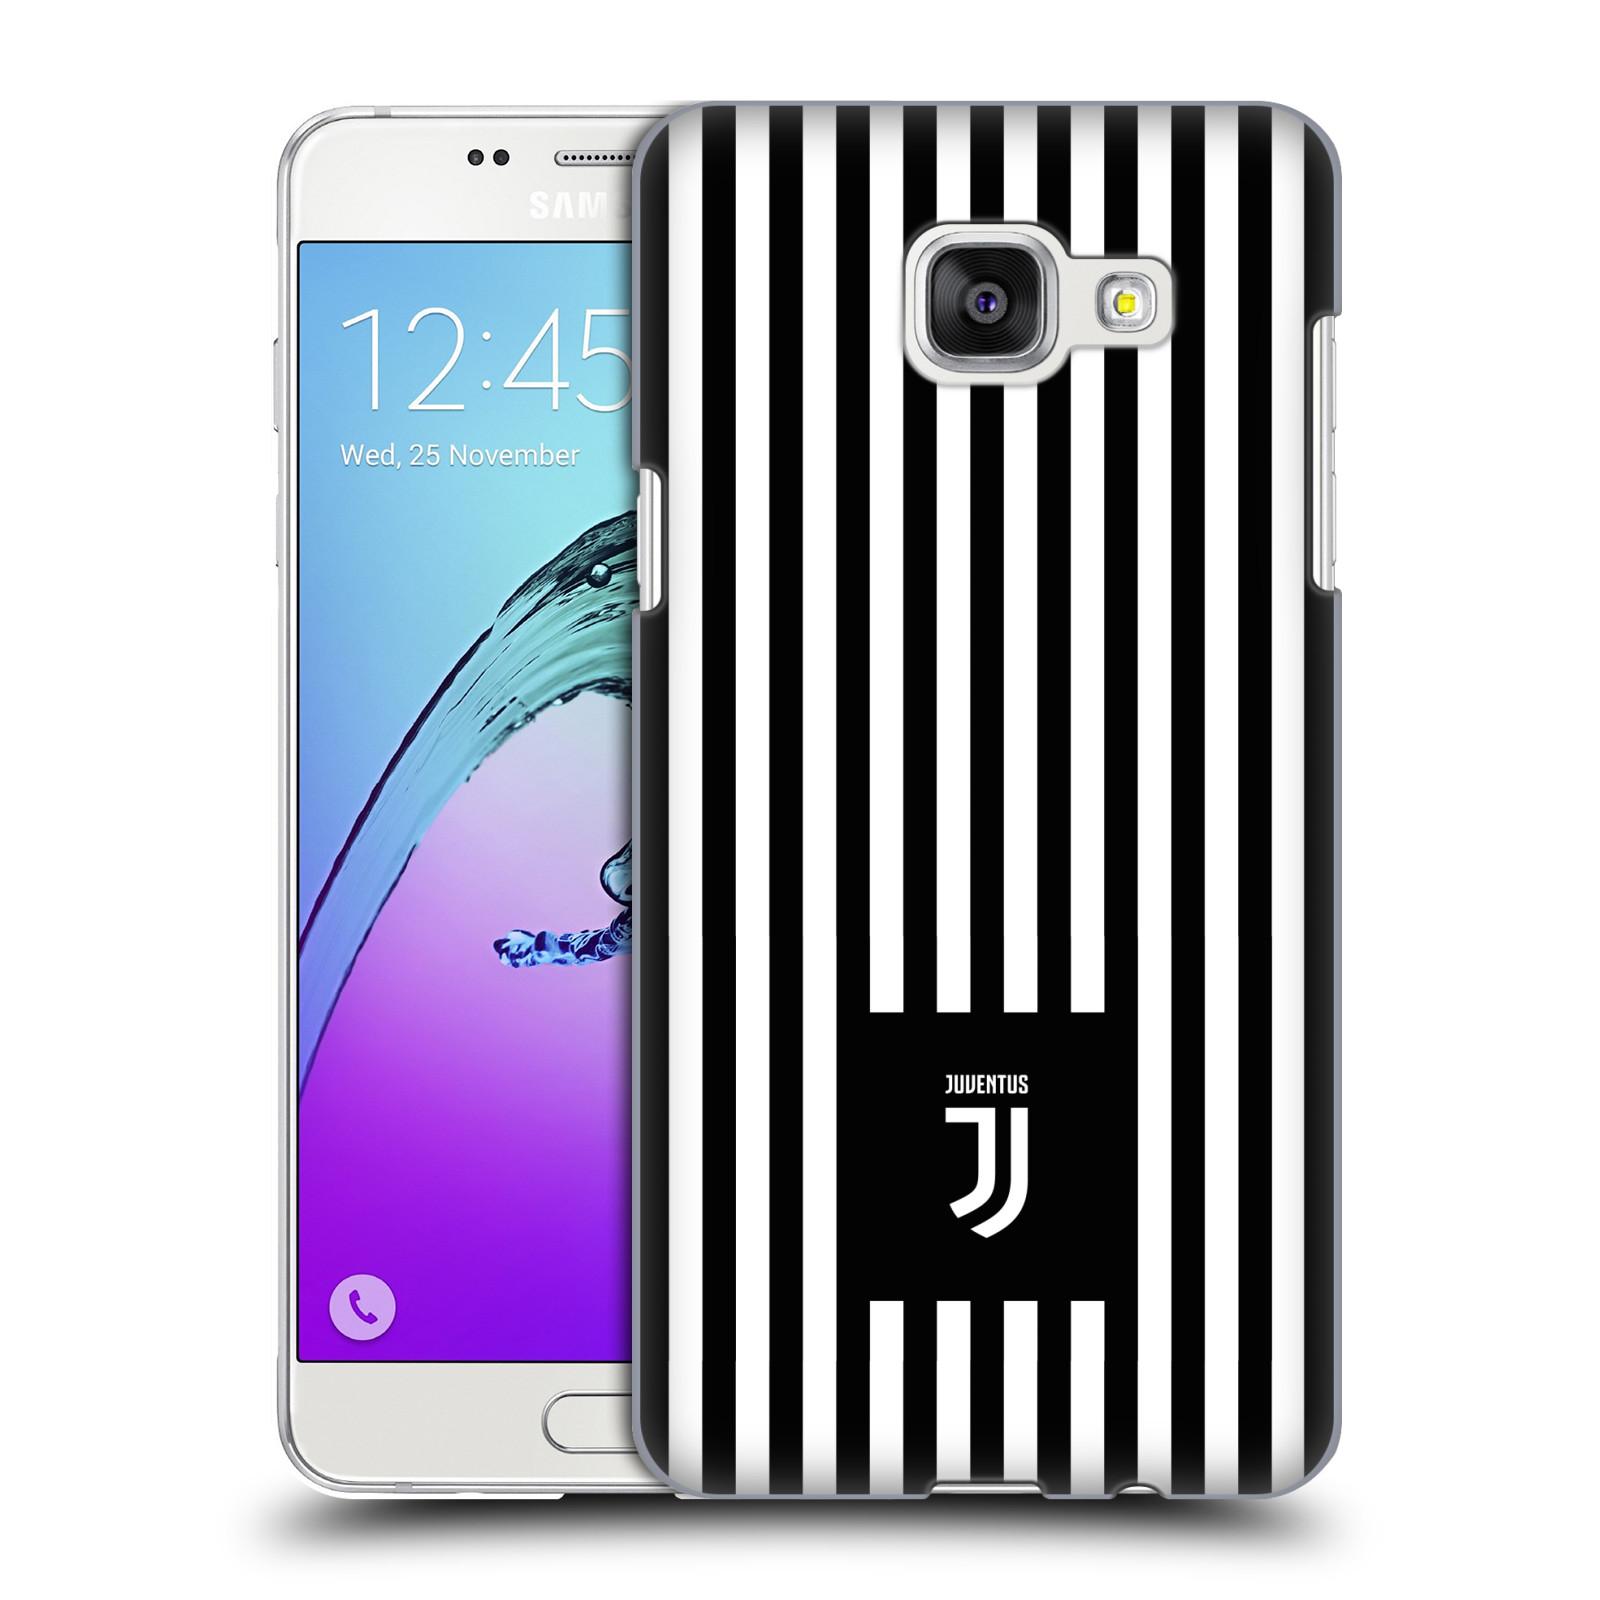 Plastové pouzdro na mobil Samsung Galaxy A5 (2016) - Head Case - Juventus FC - Nové logo - Pruhy